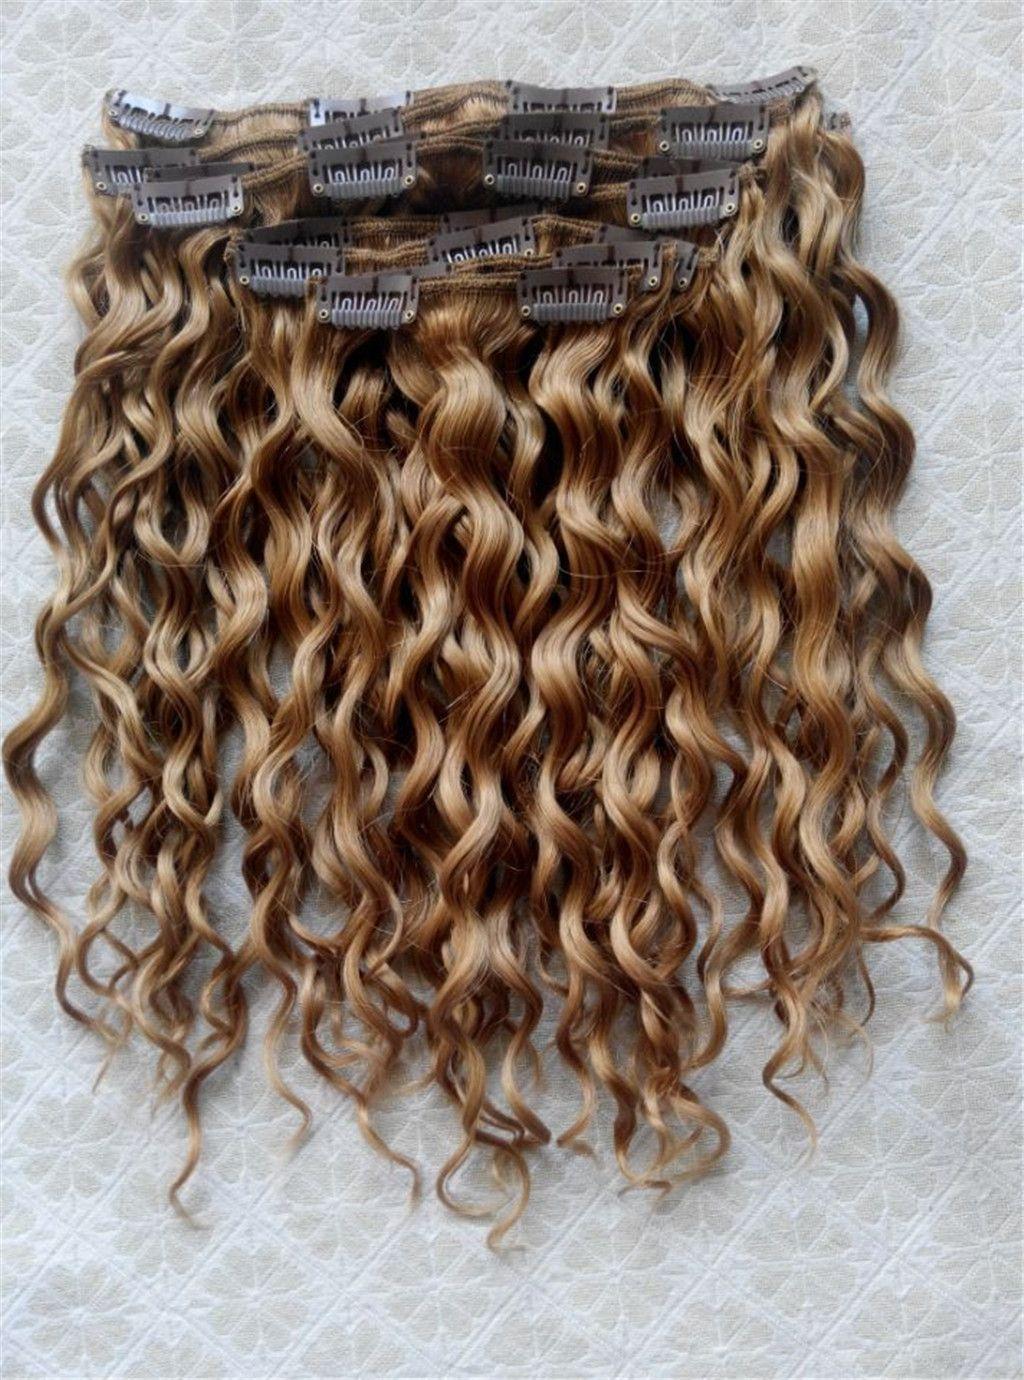 New Style Brazilian Virgin Curly Hair Weft Clip In Human Hair